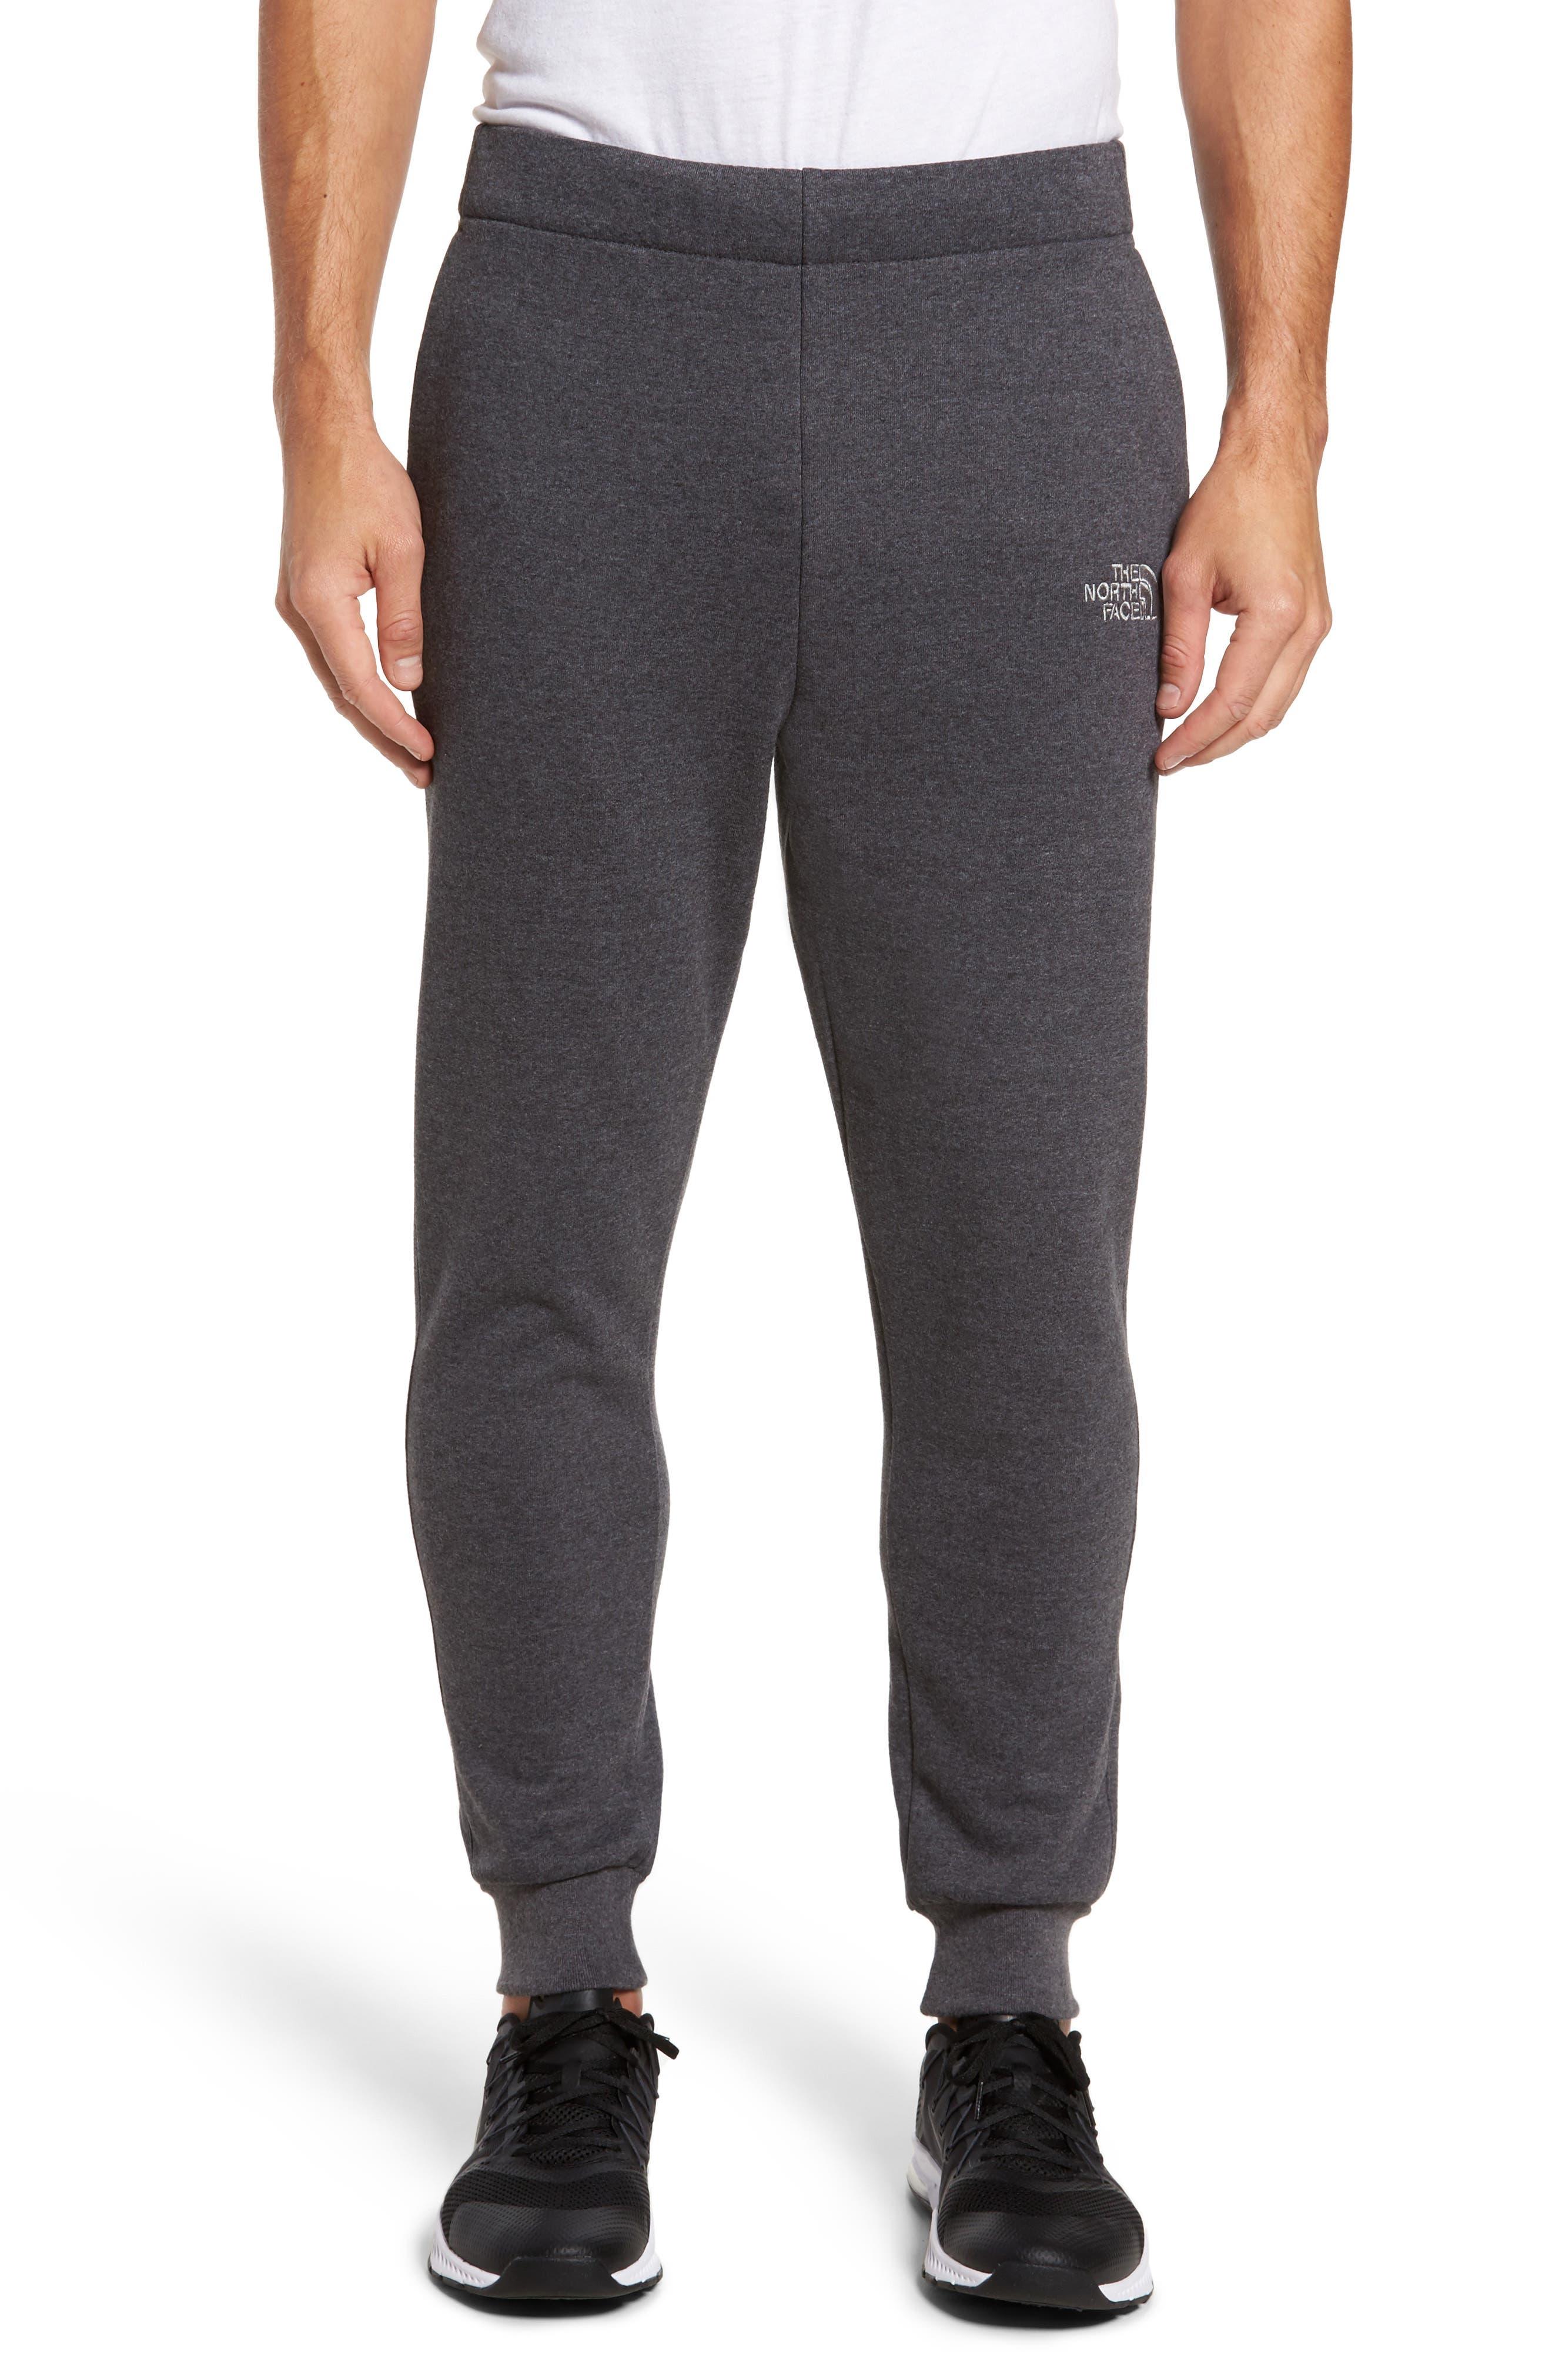 Avalon Fleece Jogger Pants,                         Main,                         color, Dark Grey Hthr/Monument Grey